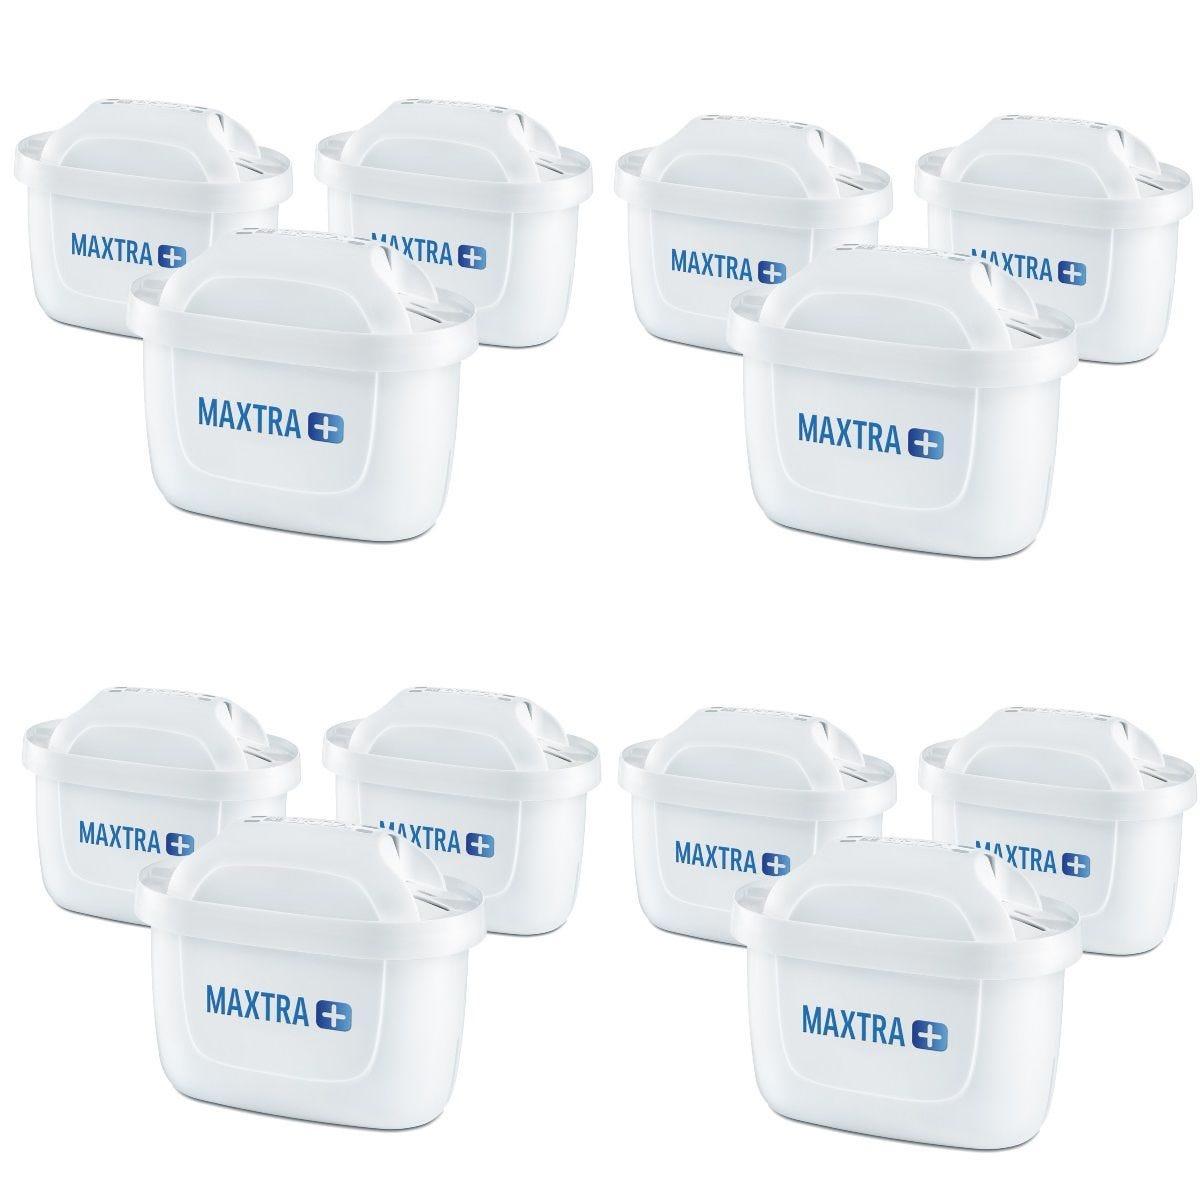 Brita Maxtra + Cartridges - 12 Pack